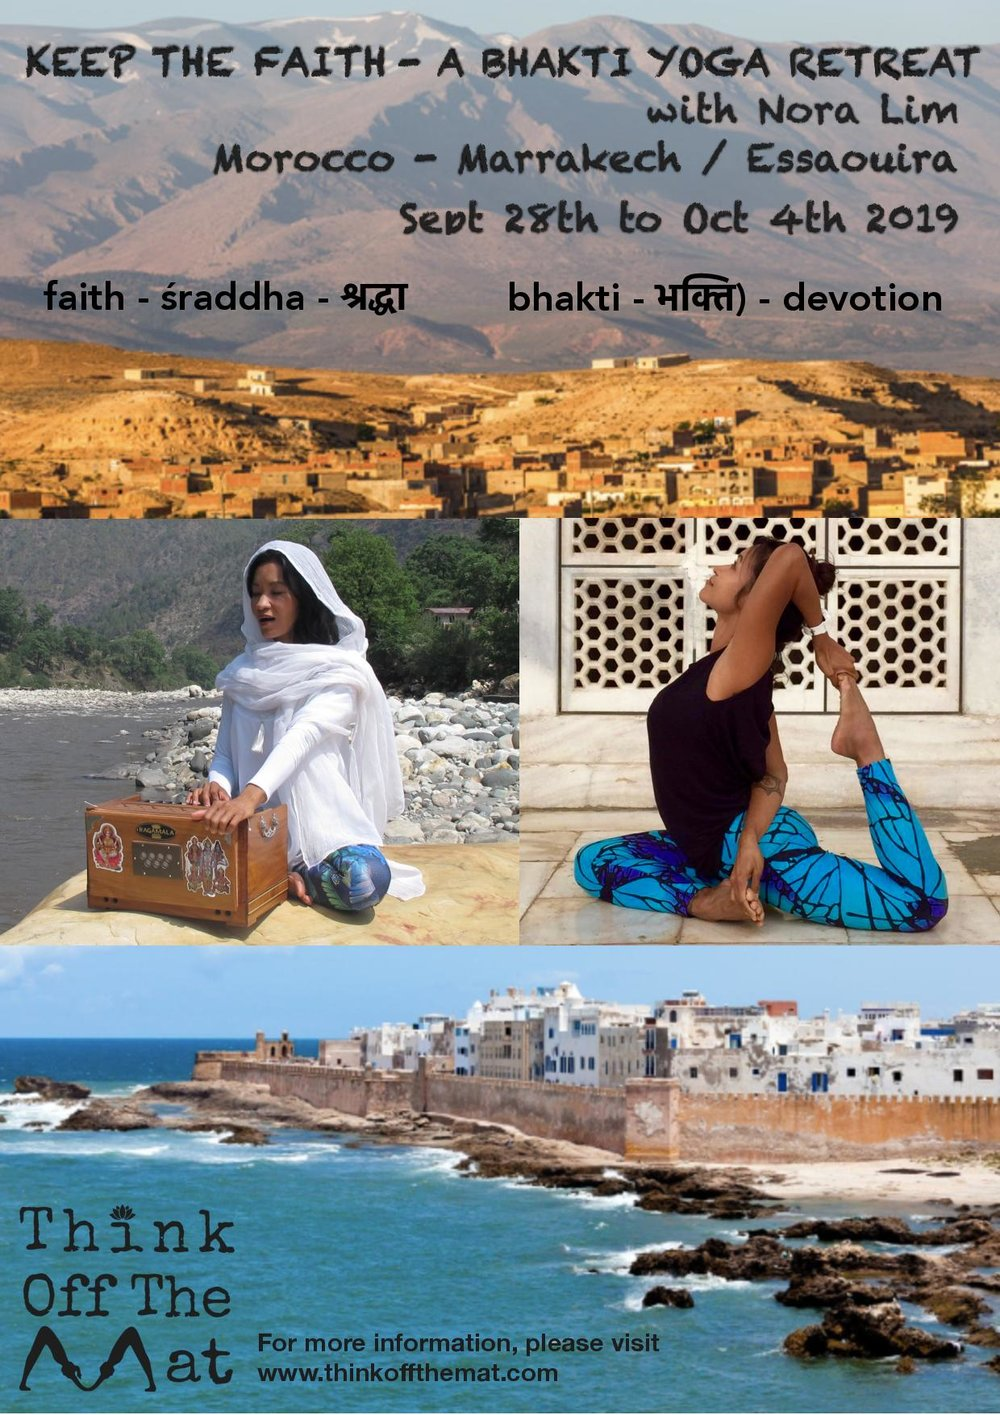 Keep the Faith - A Bhakti Yoga Retreat-page-001.jpg